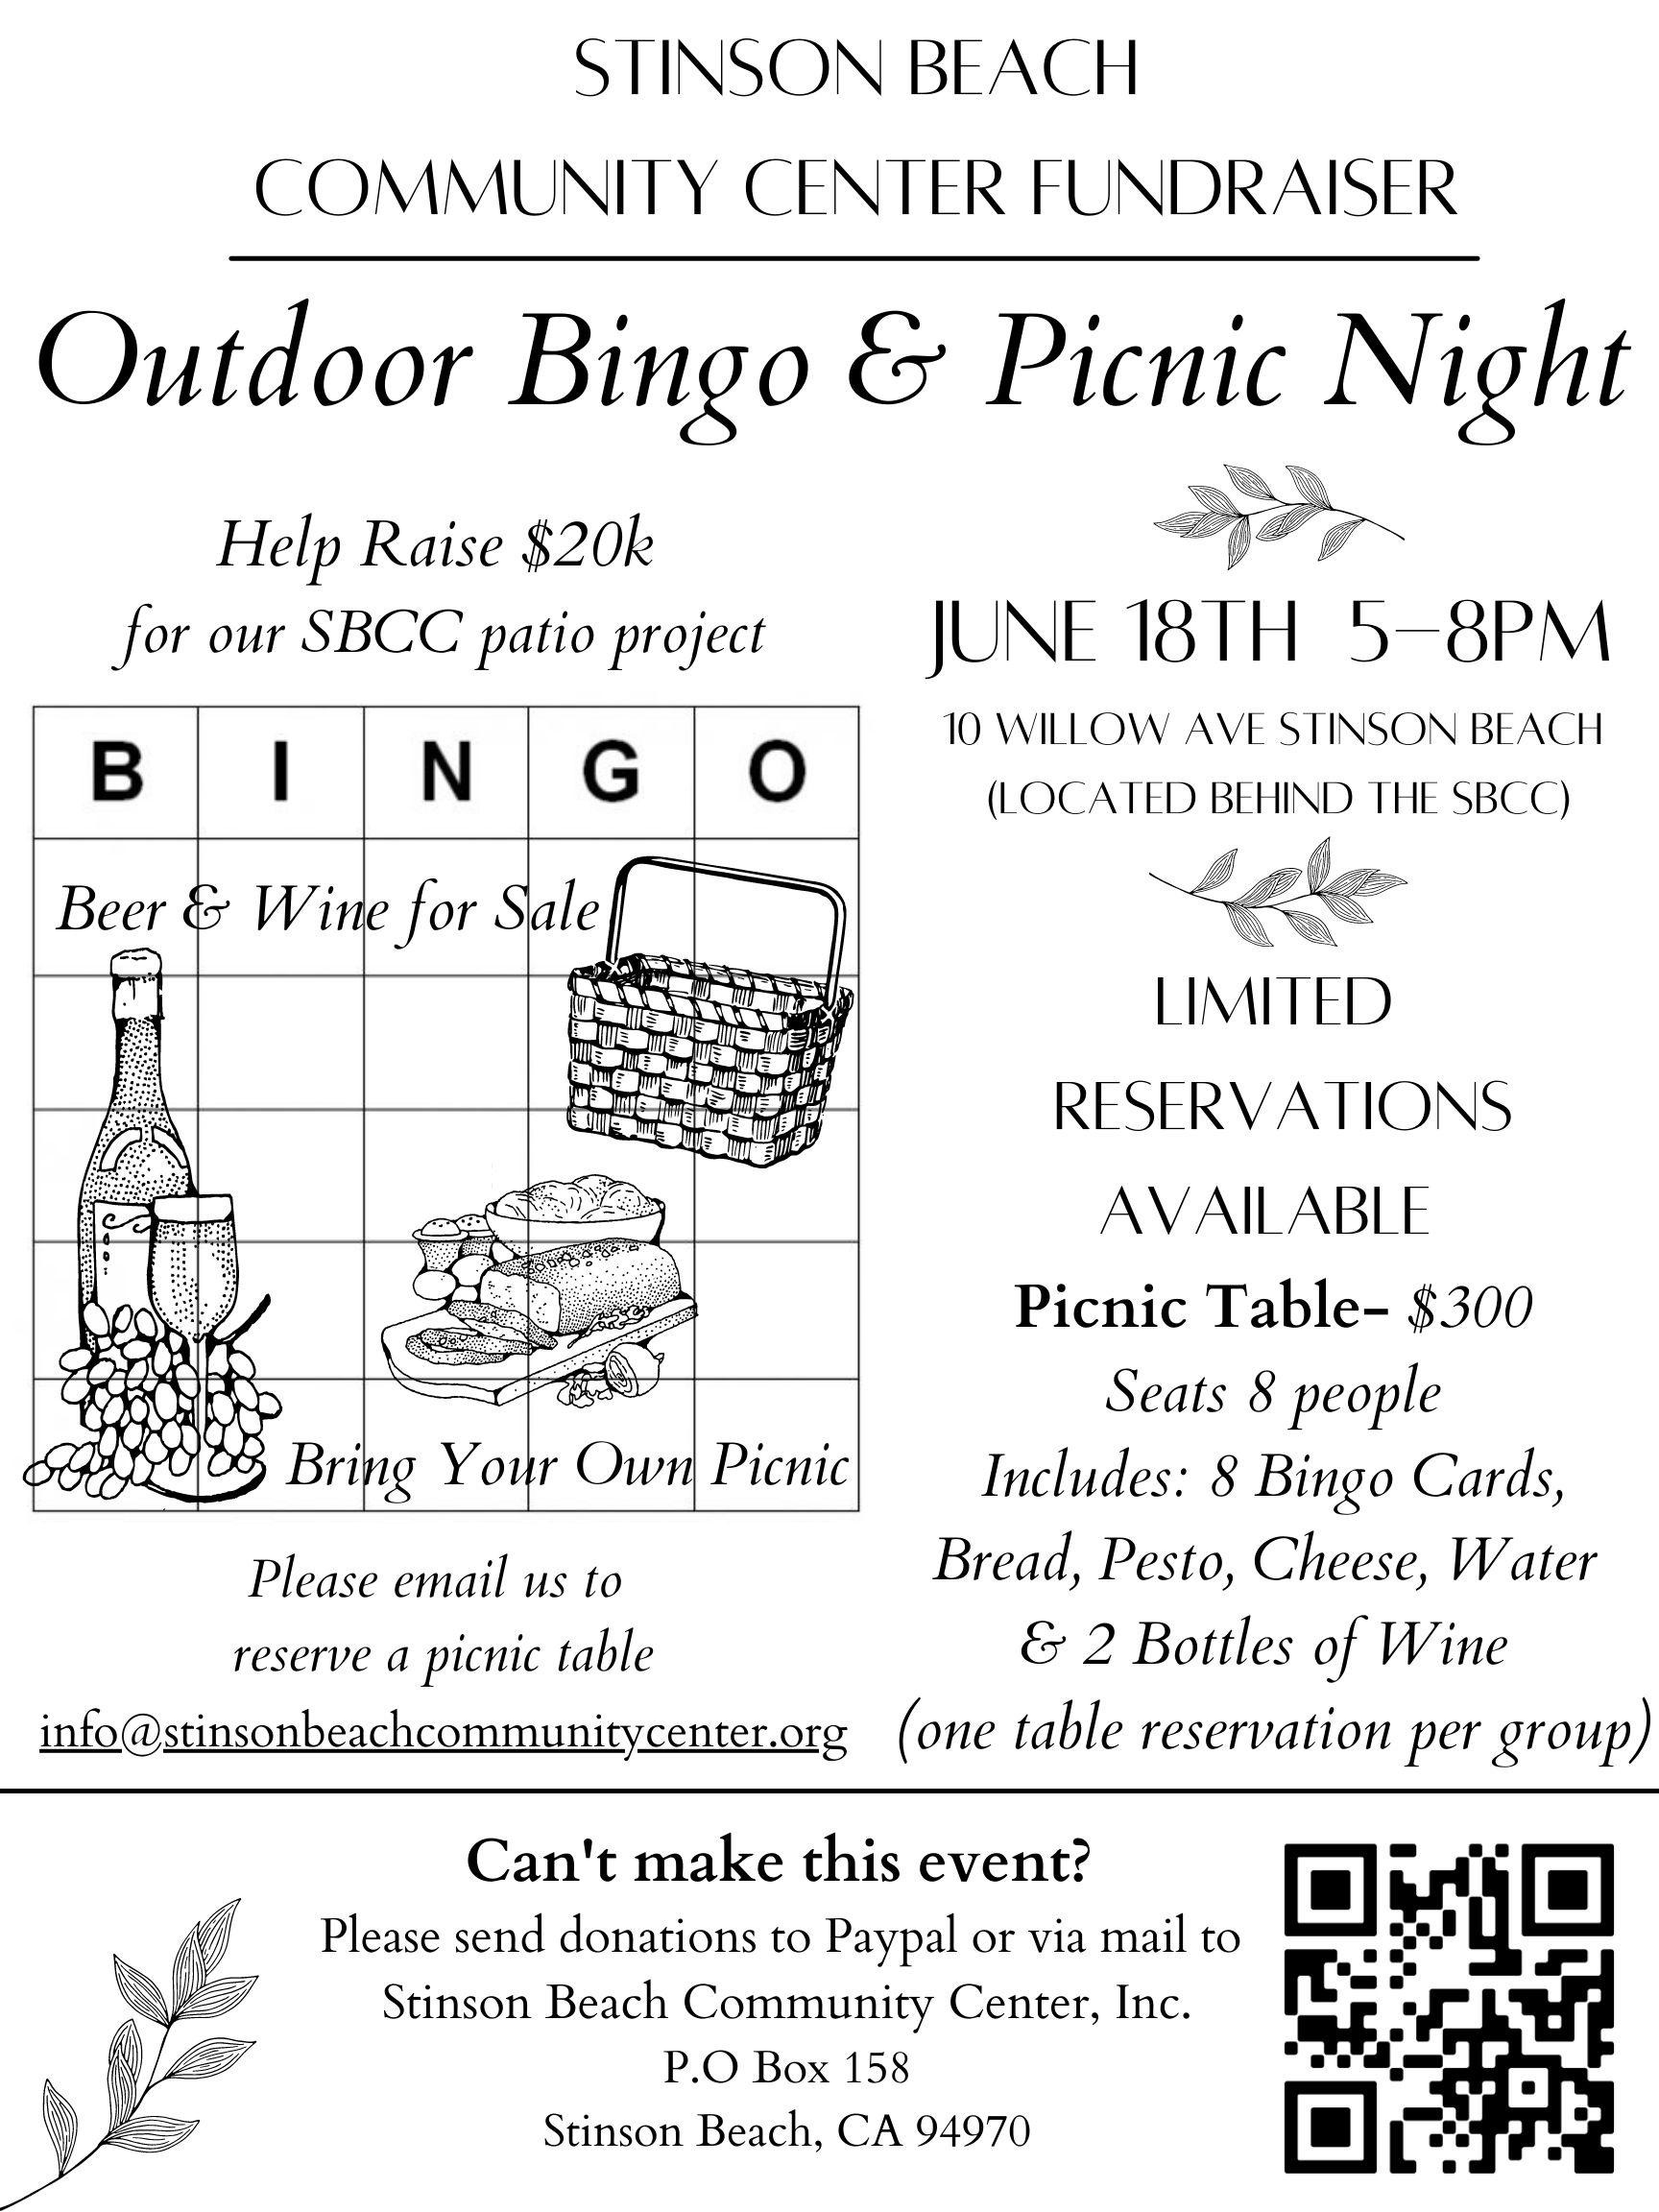 🧺 Outdoor Bingo & Picnic Night Fundraiser